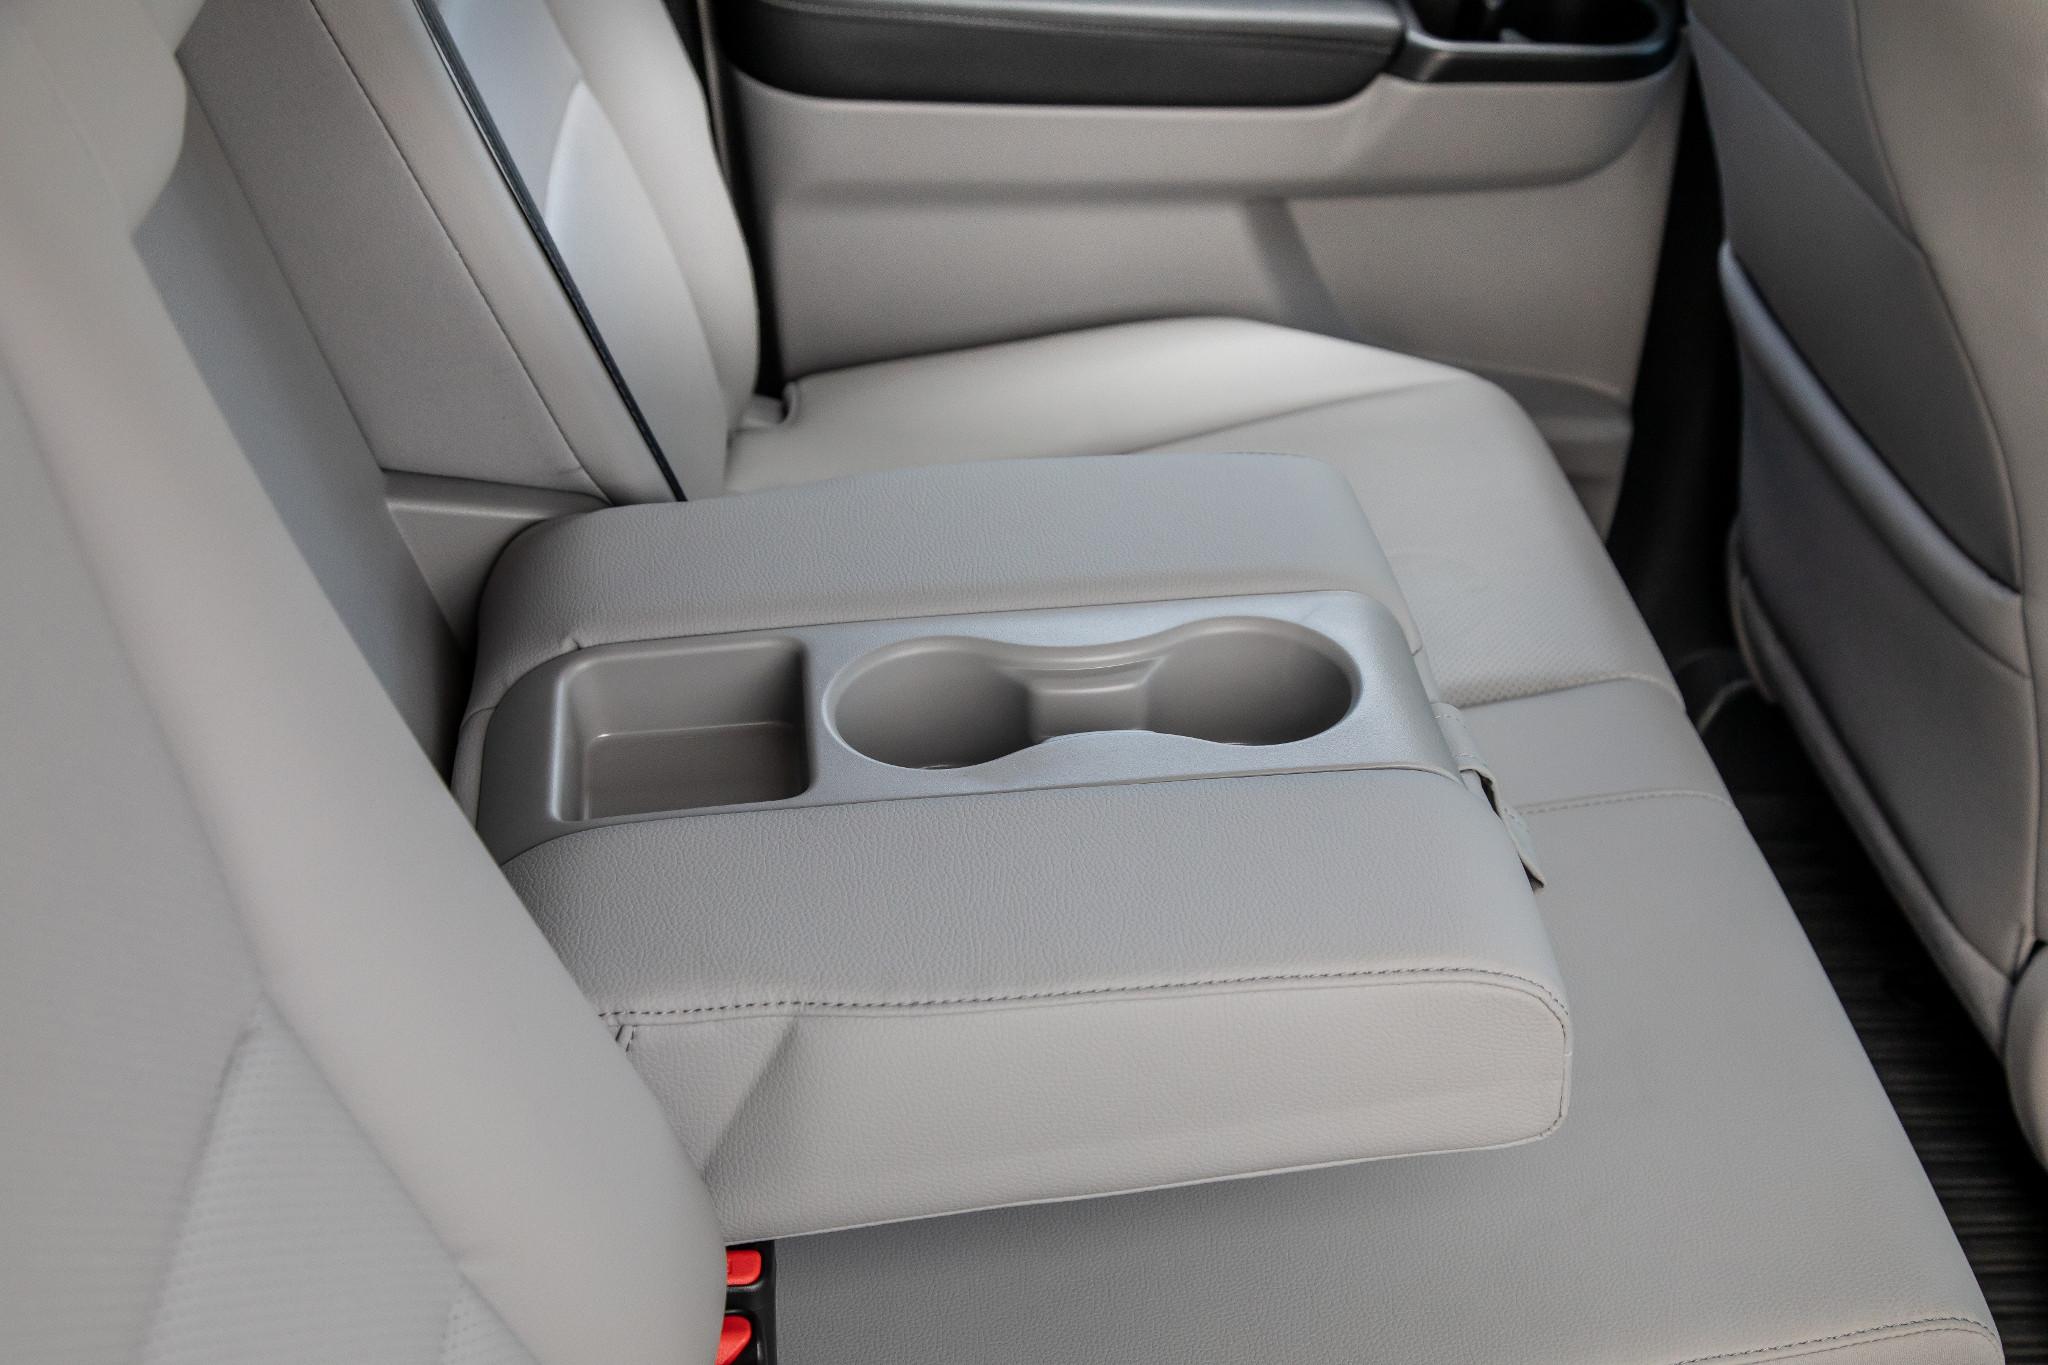 honda-ridgeline-2019-57-armrest--cupholders--interior--second-row.jpg